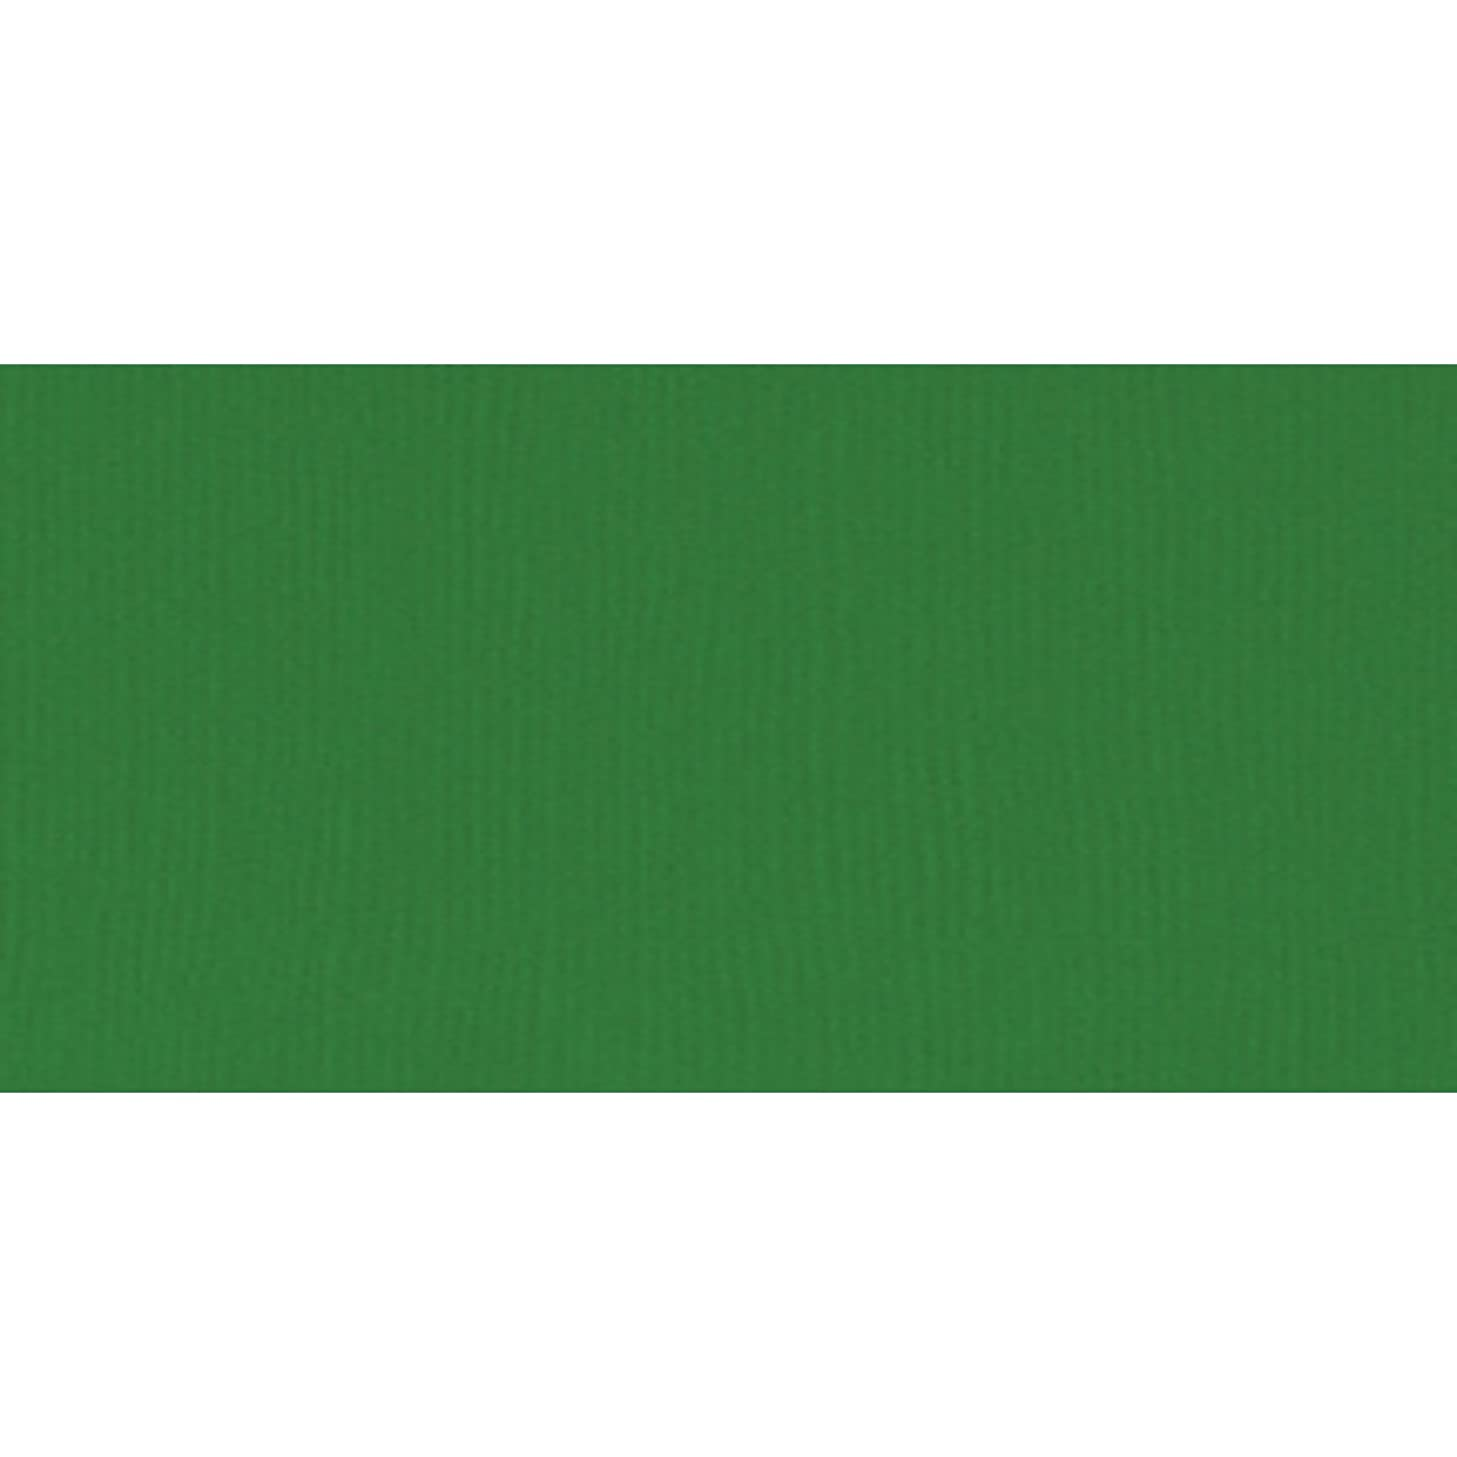 American Crafts 300496 Bazzill Basics Mono Adhesive Cardstock 12 X 12 Inch Bazzill Green